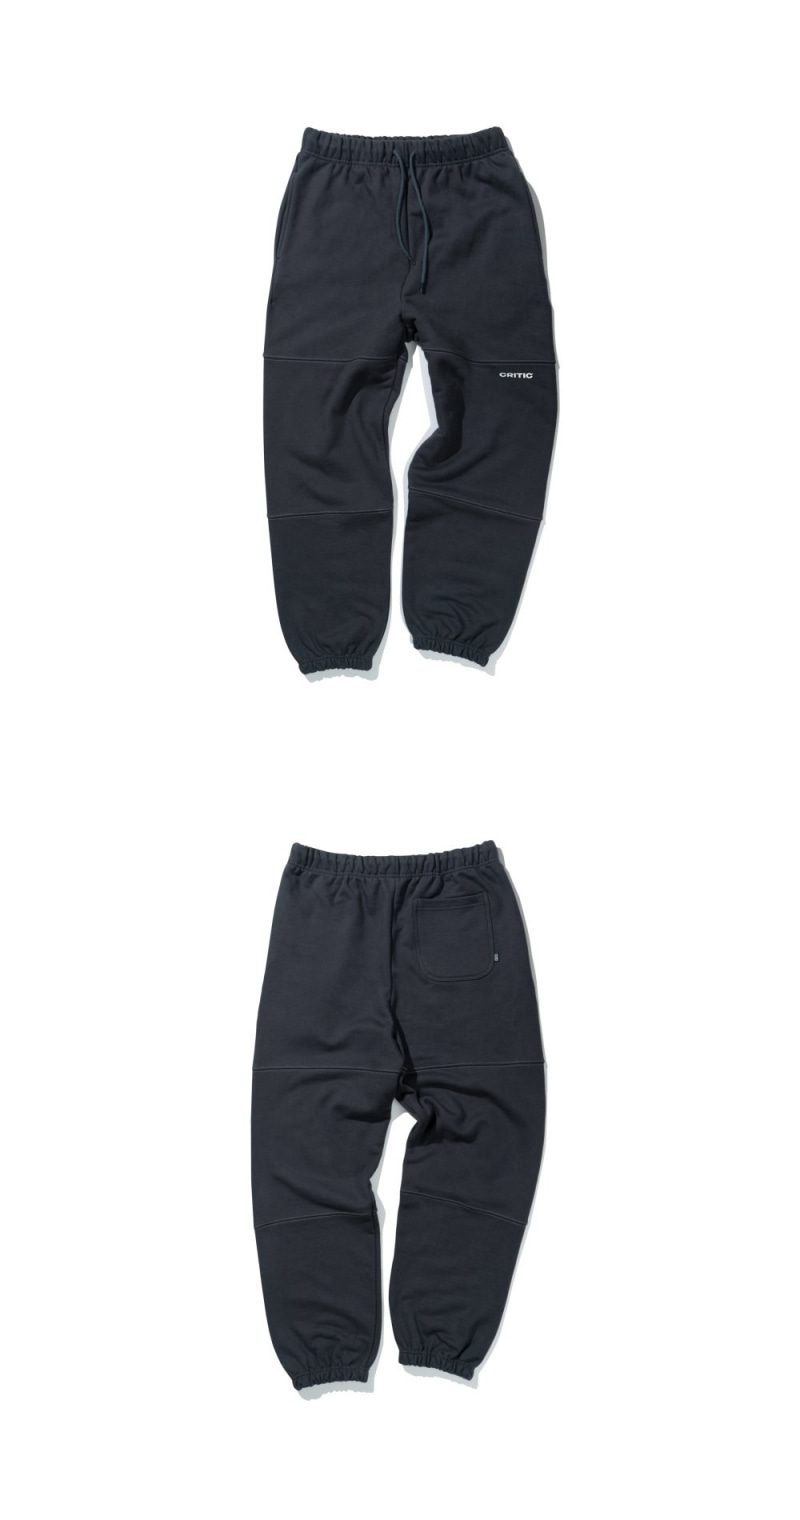 HEAVY SWEAT PANTS(CHARCOAL)_CTTZIPT02UC1